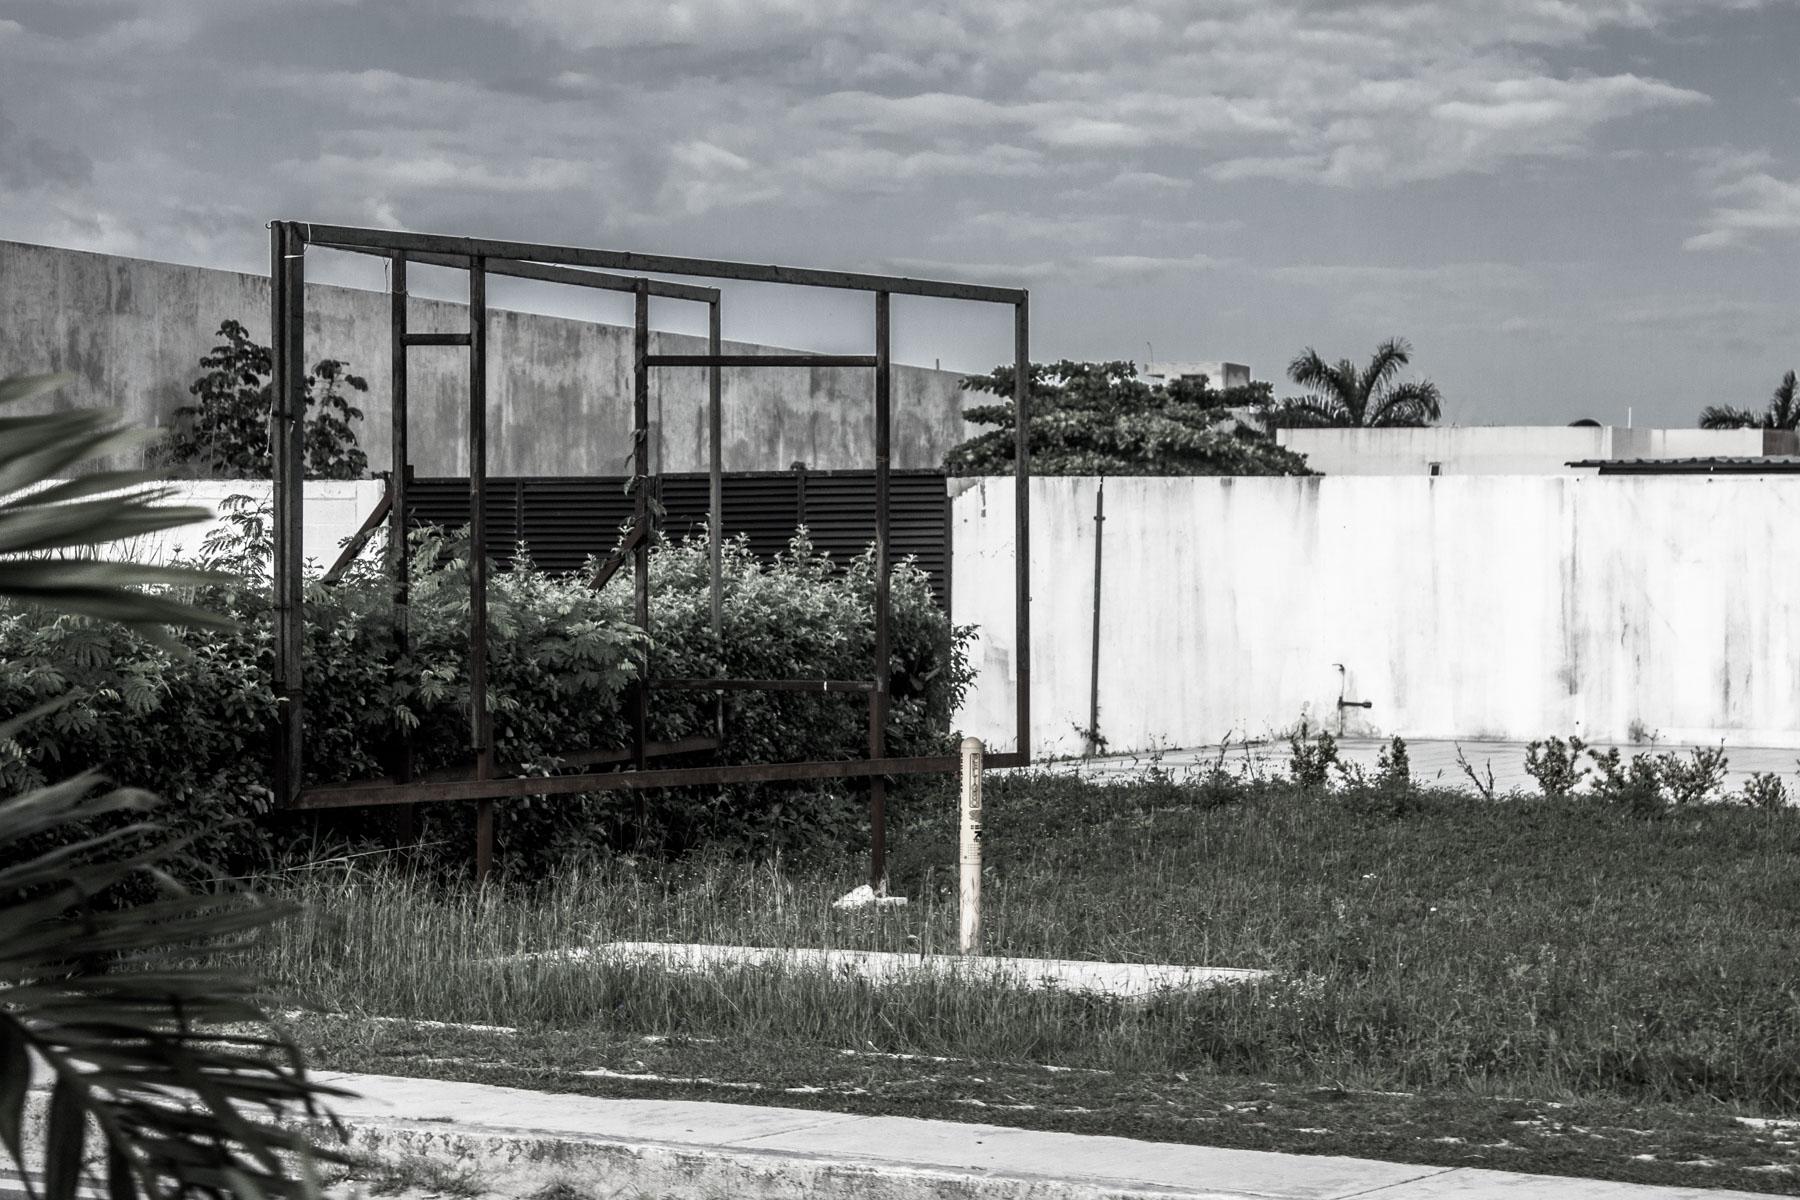 Paisaje Arquetipo - fotografo artista colombiano-2465.jpg